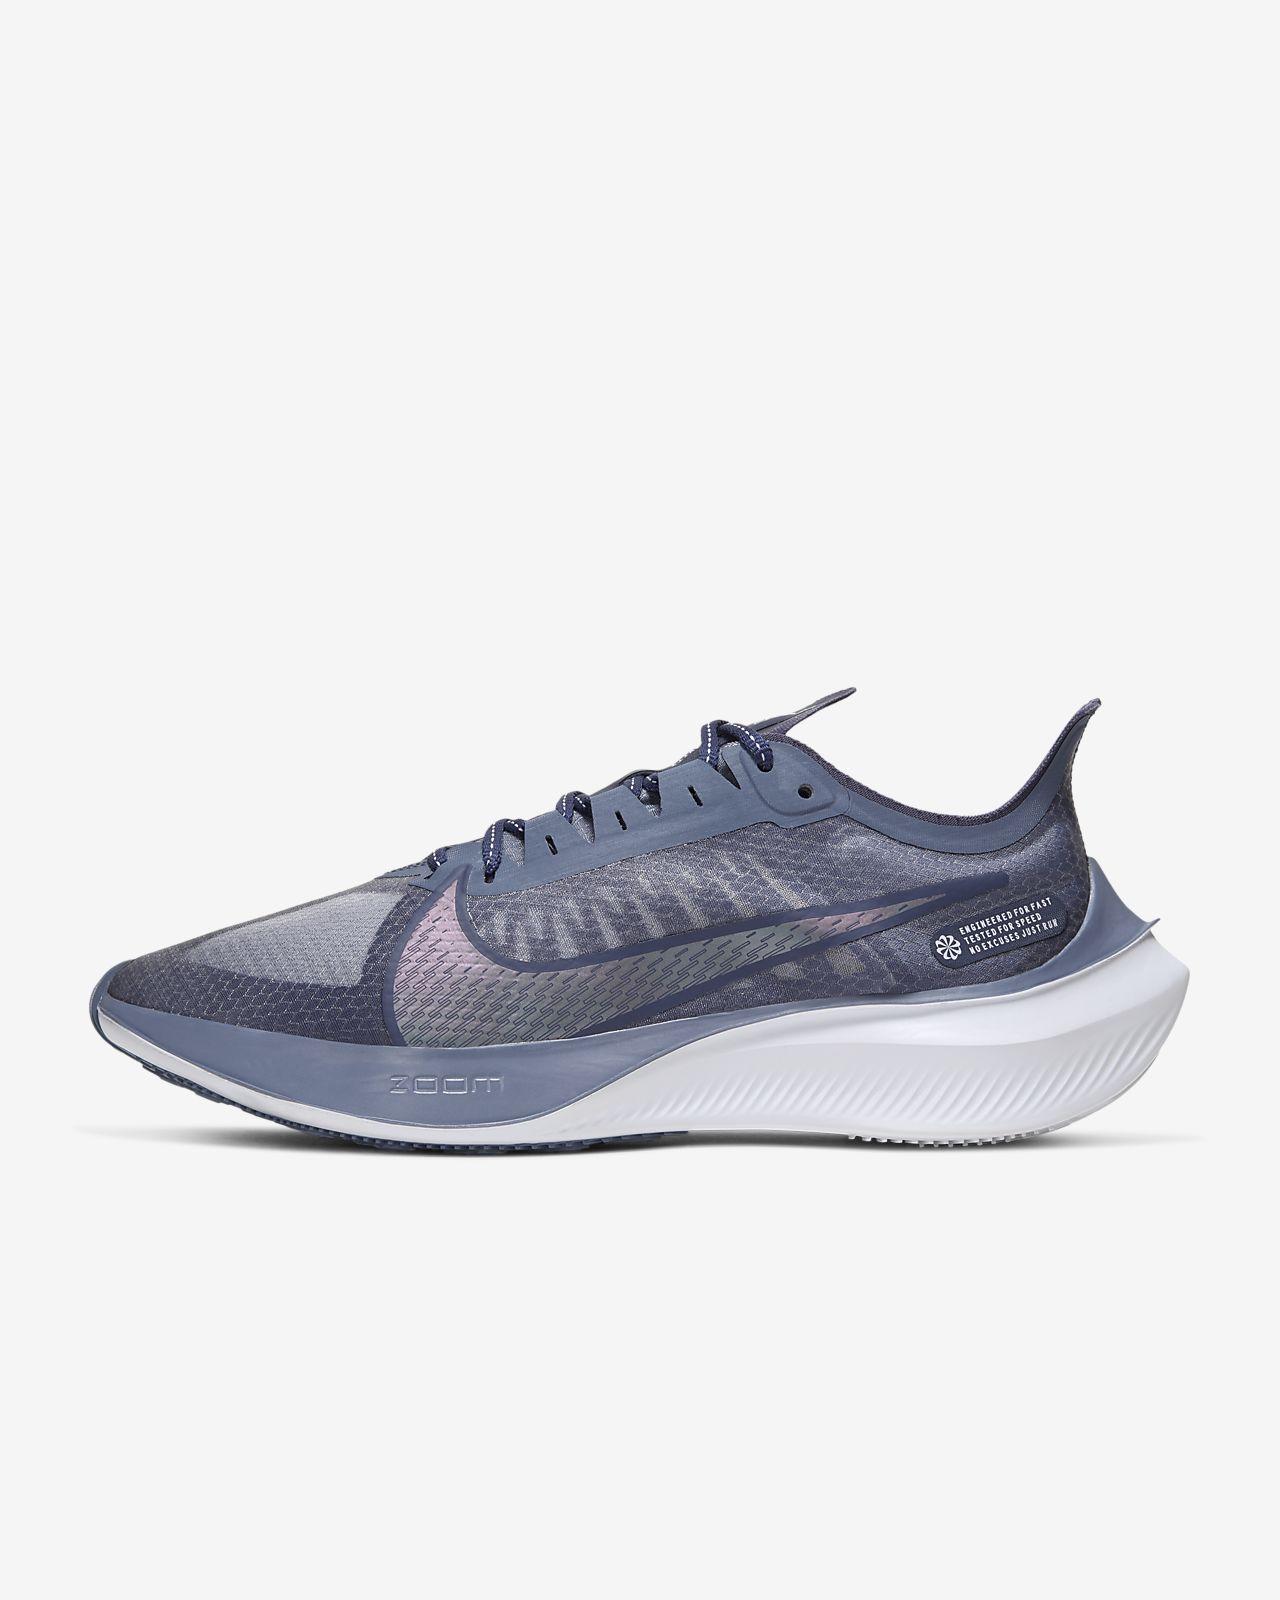 Sapatilhas de running Nike Zoom Gravity para mulher